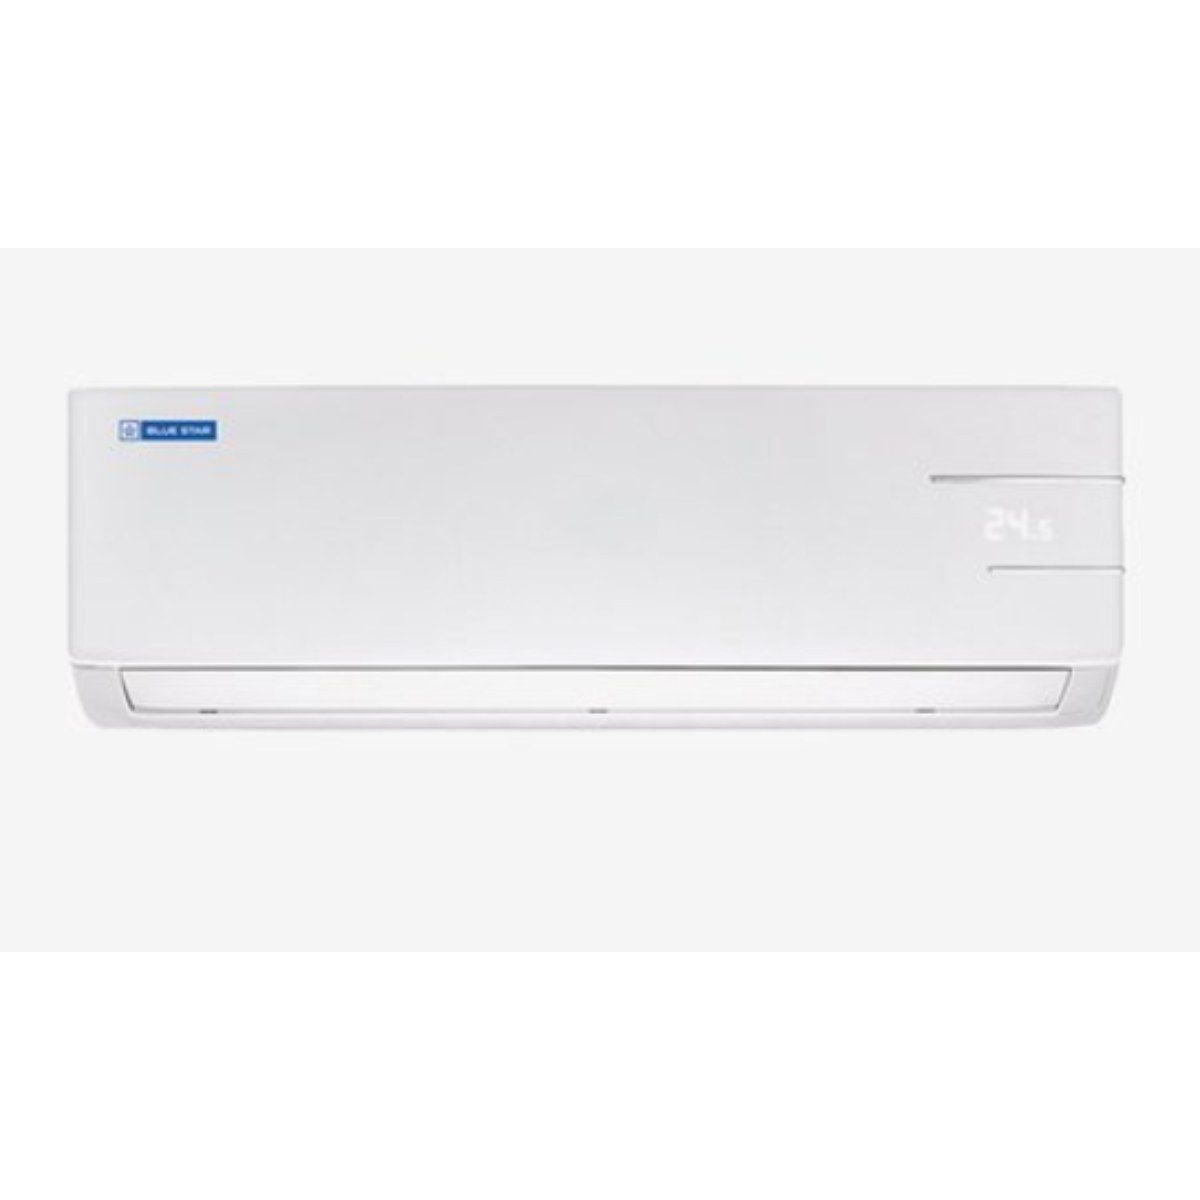 Blue Star 1 Ton 3 Star Split Air Conditioner(FS312YATU)